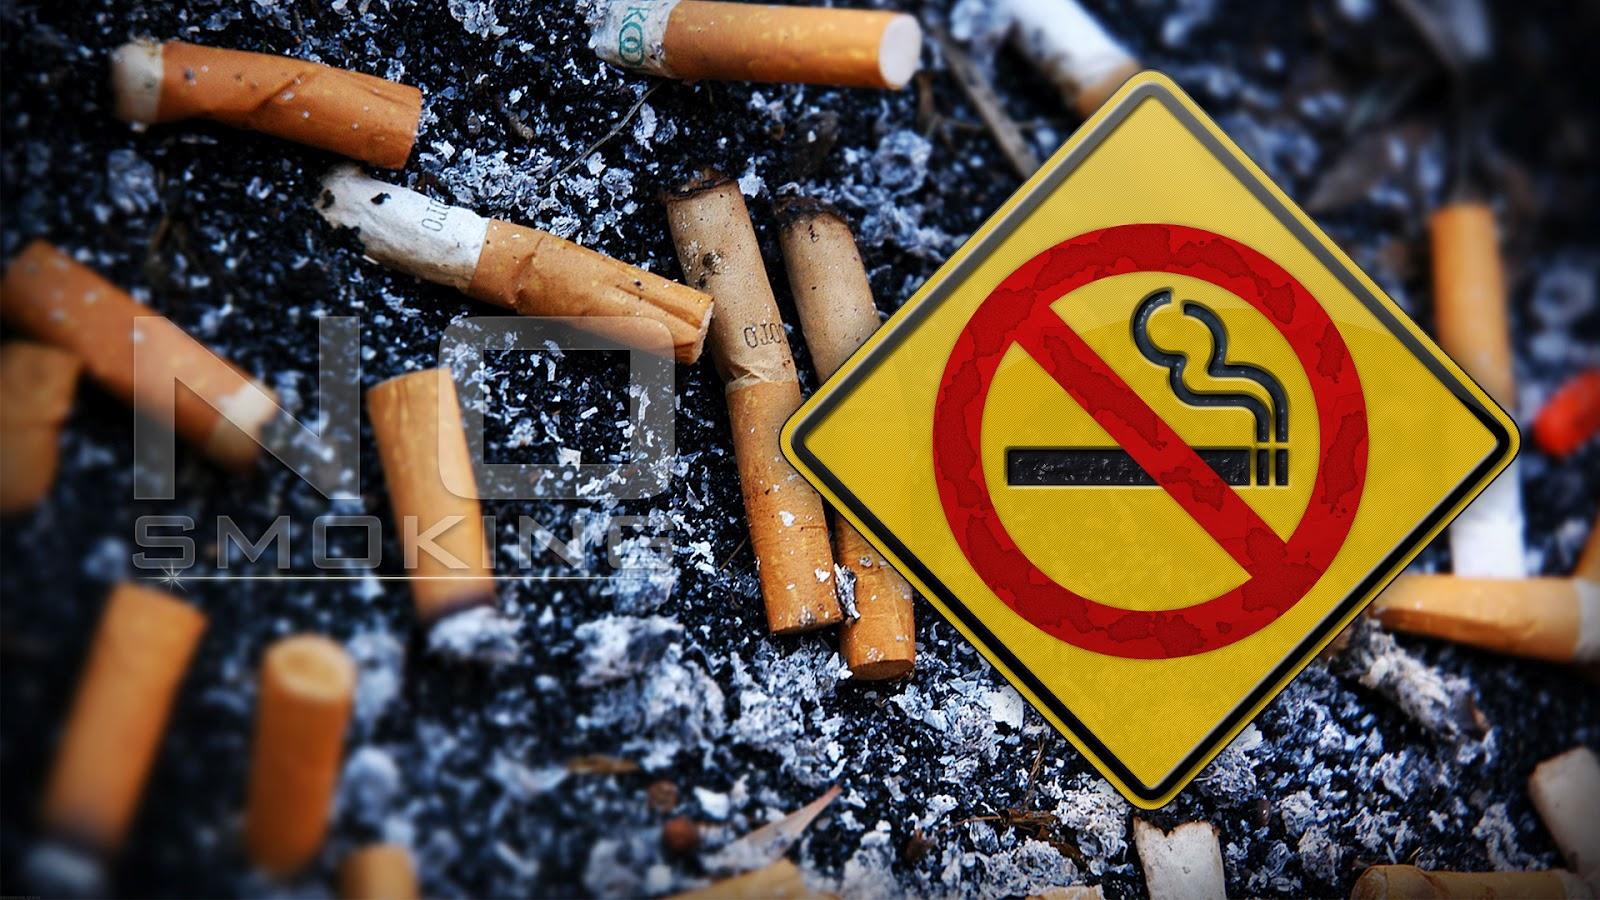 http://2.bp.blogspot.com/-Kve922P2l40/UApJZD2sbjI/AAAAAAAADZE/WM4shTKz_Bo/s1600/no_smoking_w_by_vicing.jpg